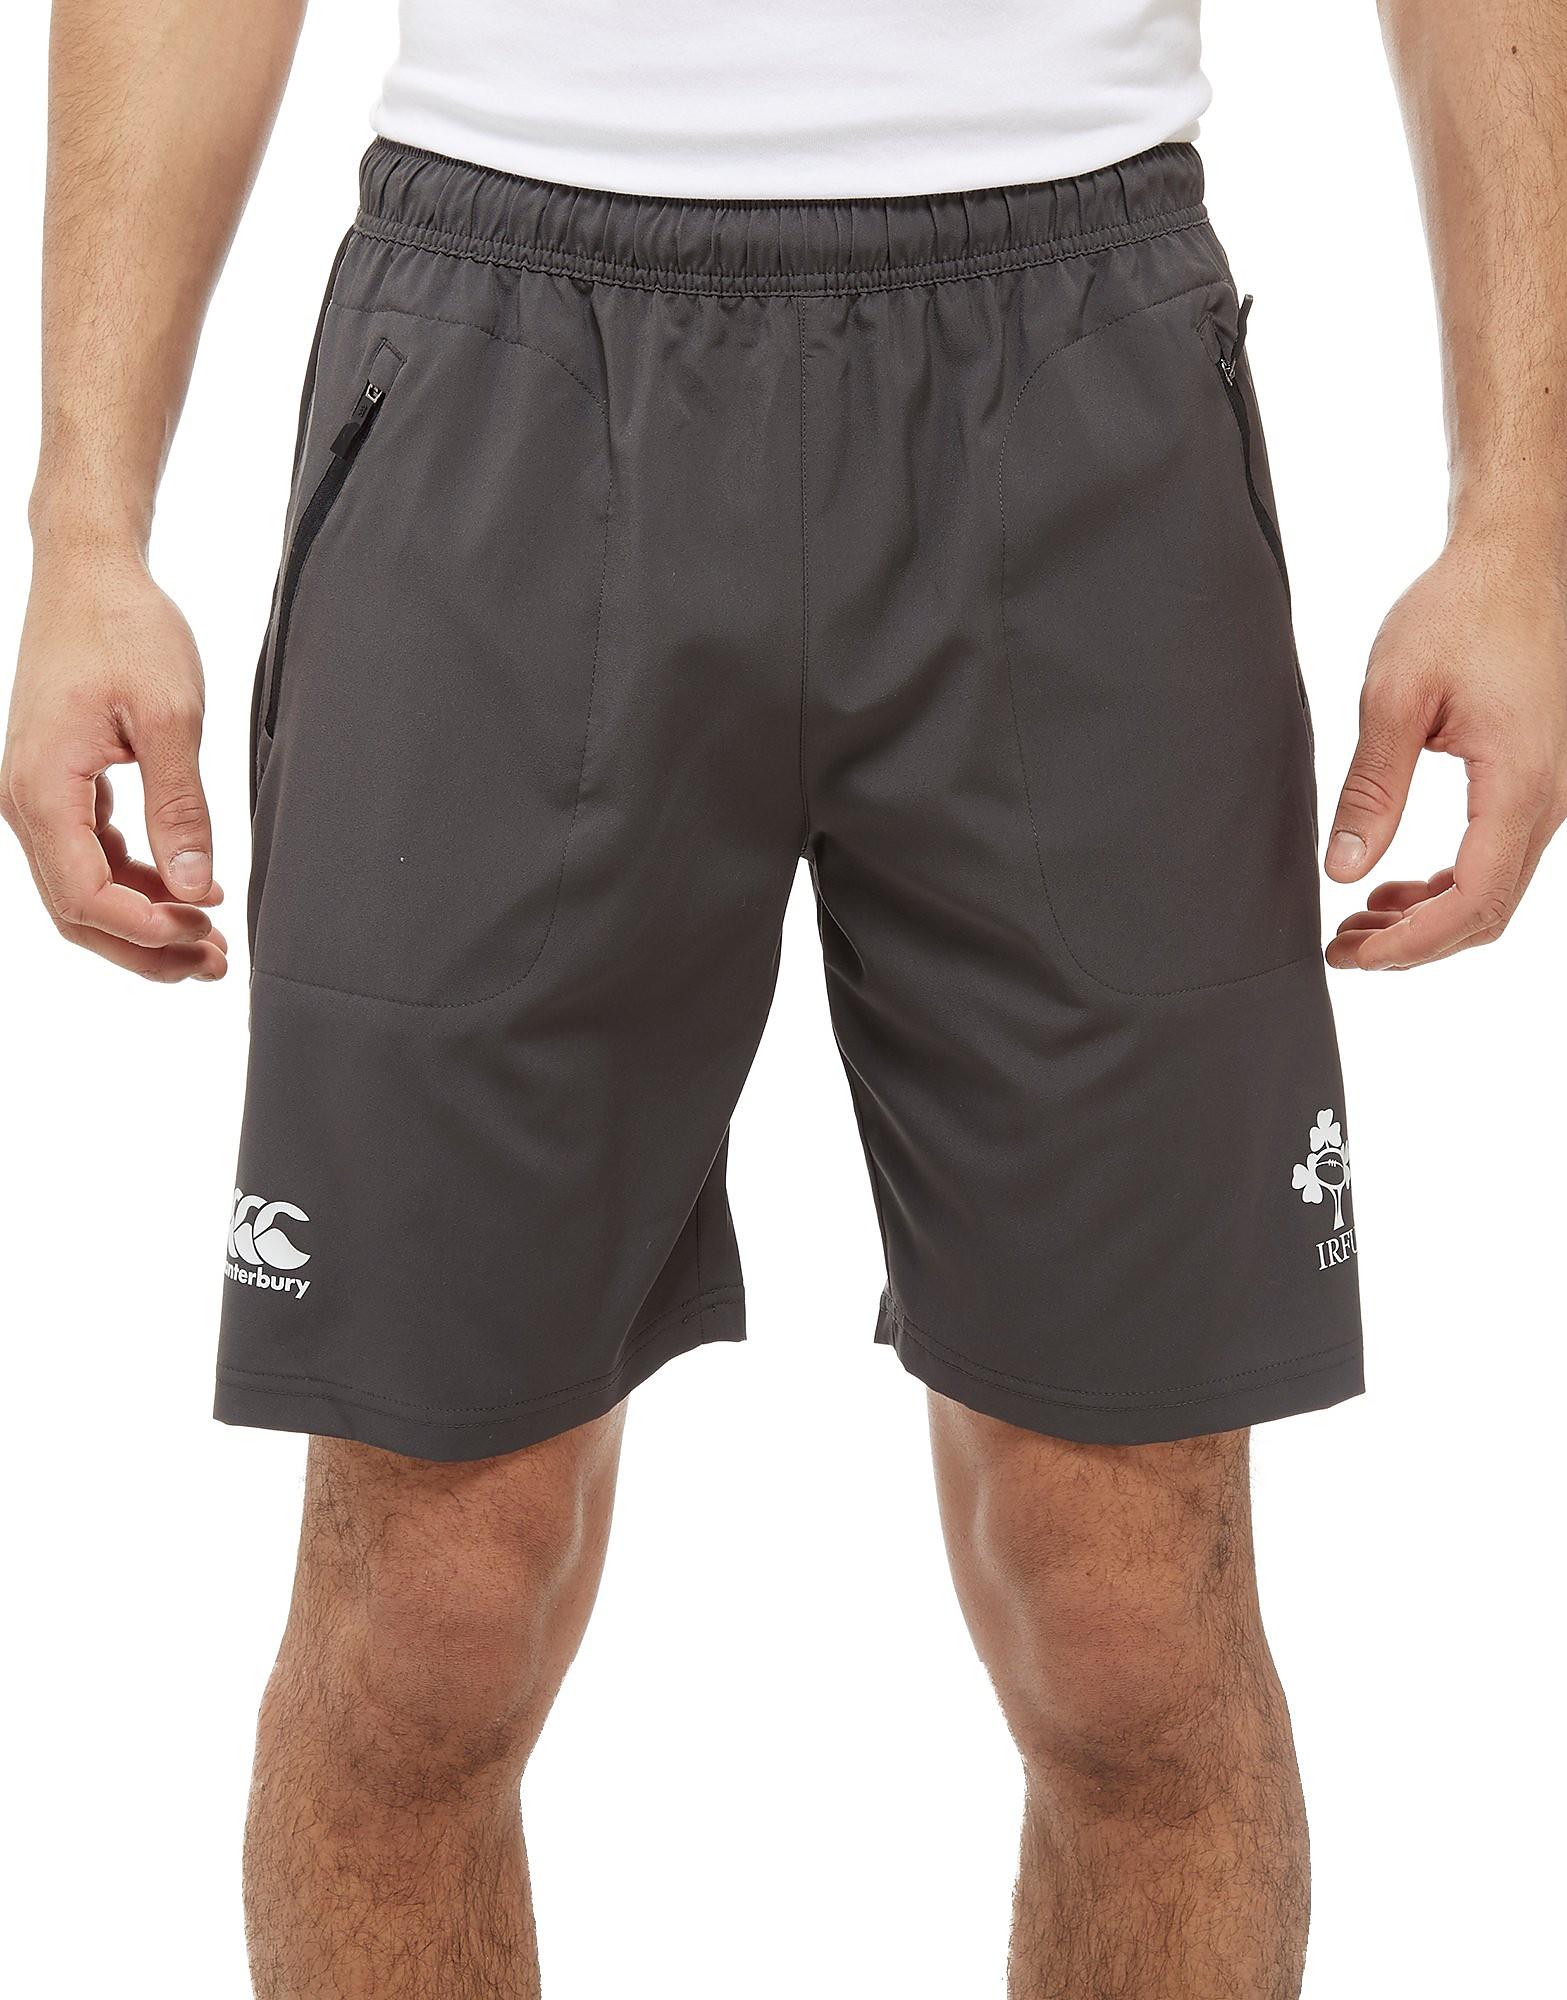 Canterbury Ireland RFU Woven Gym Shorts